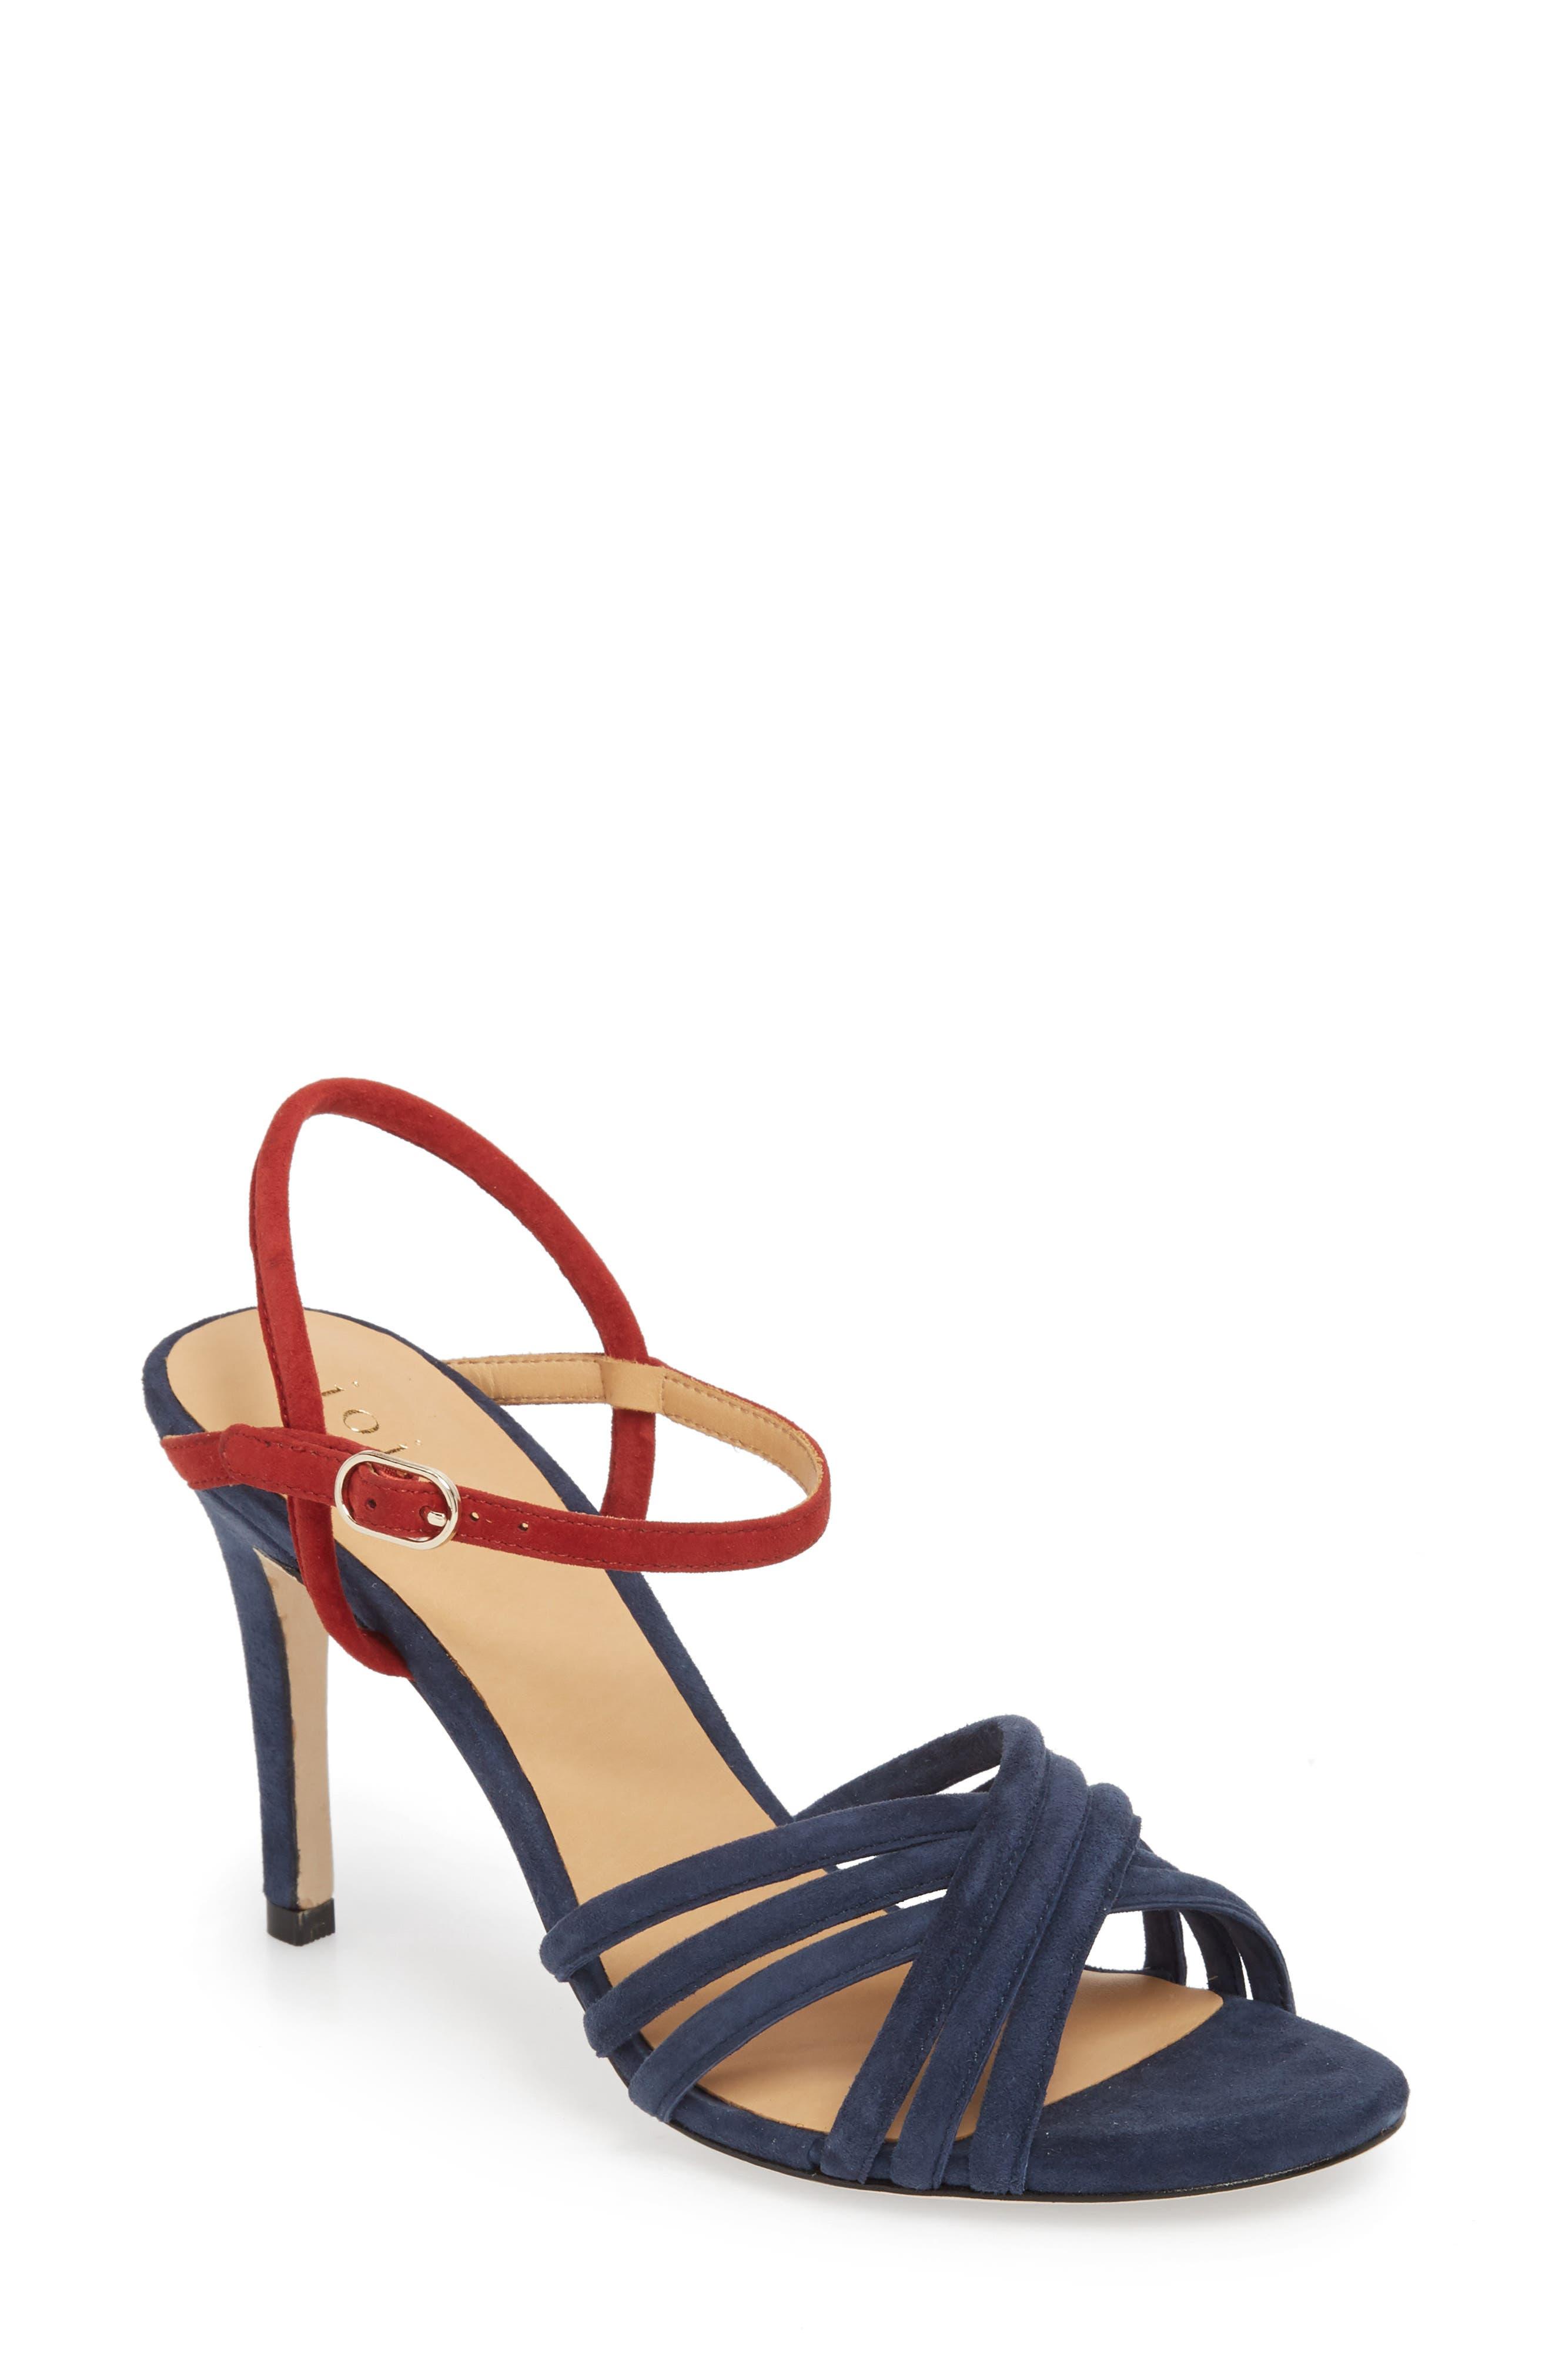 Amerton Sandal,                         Main,                         color, Navy